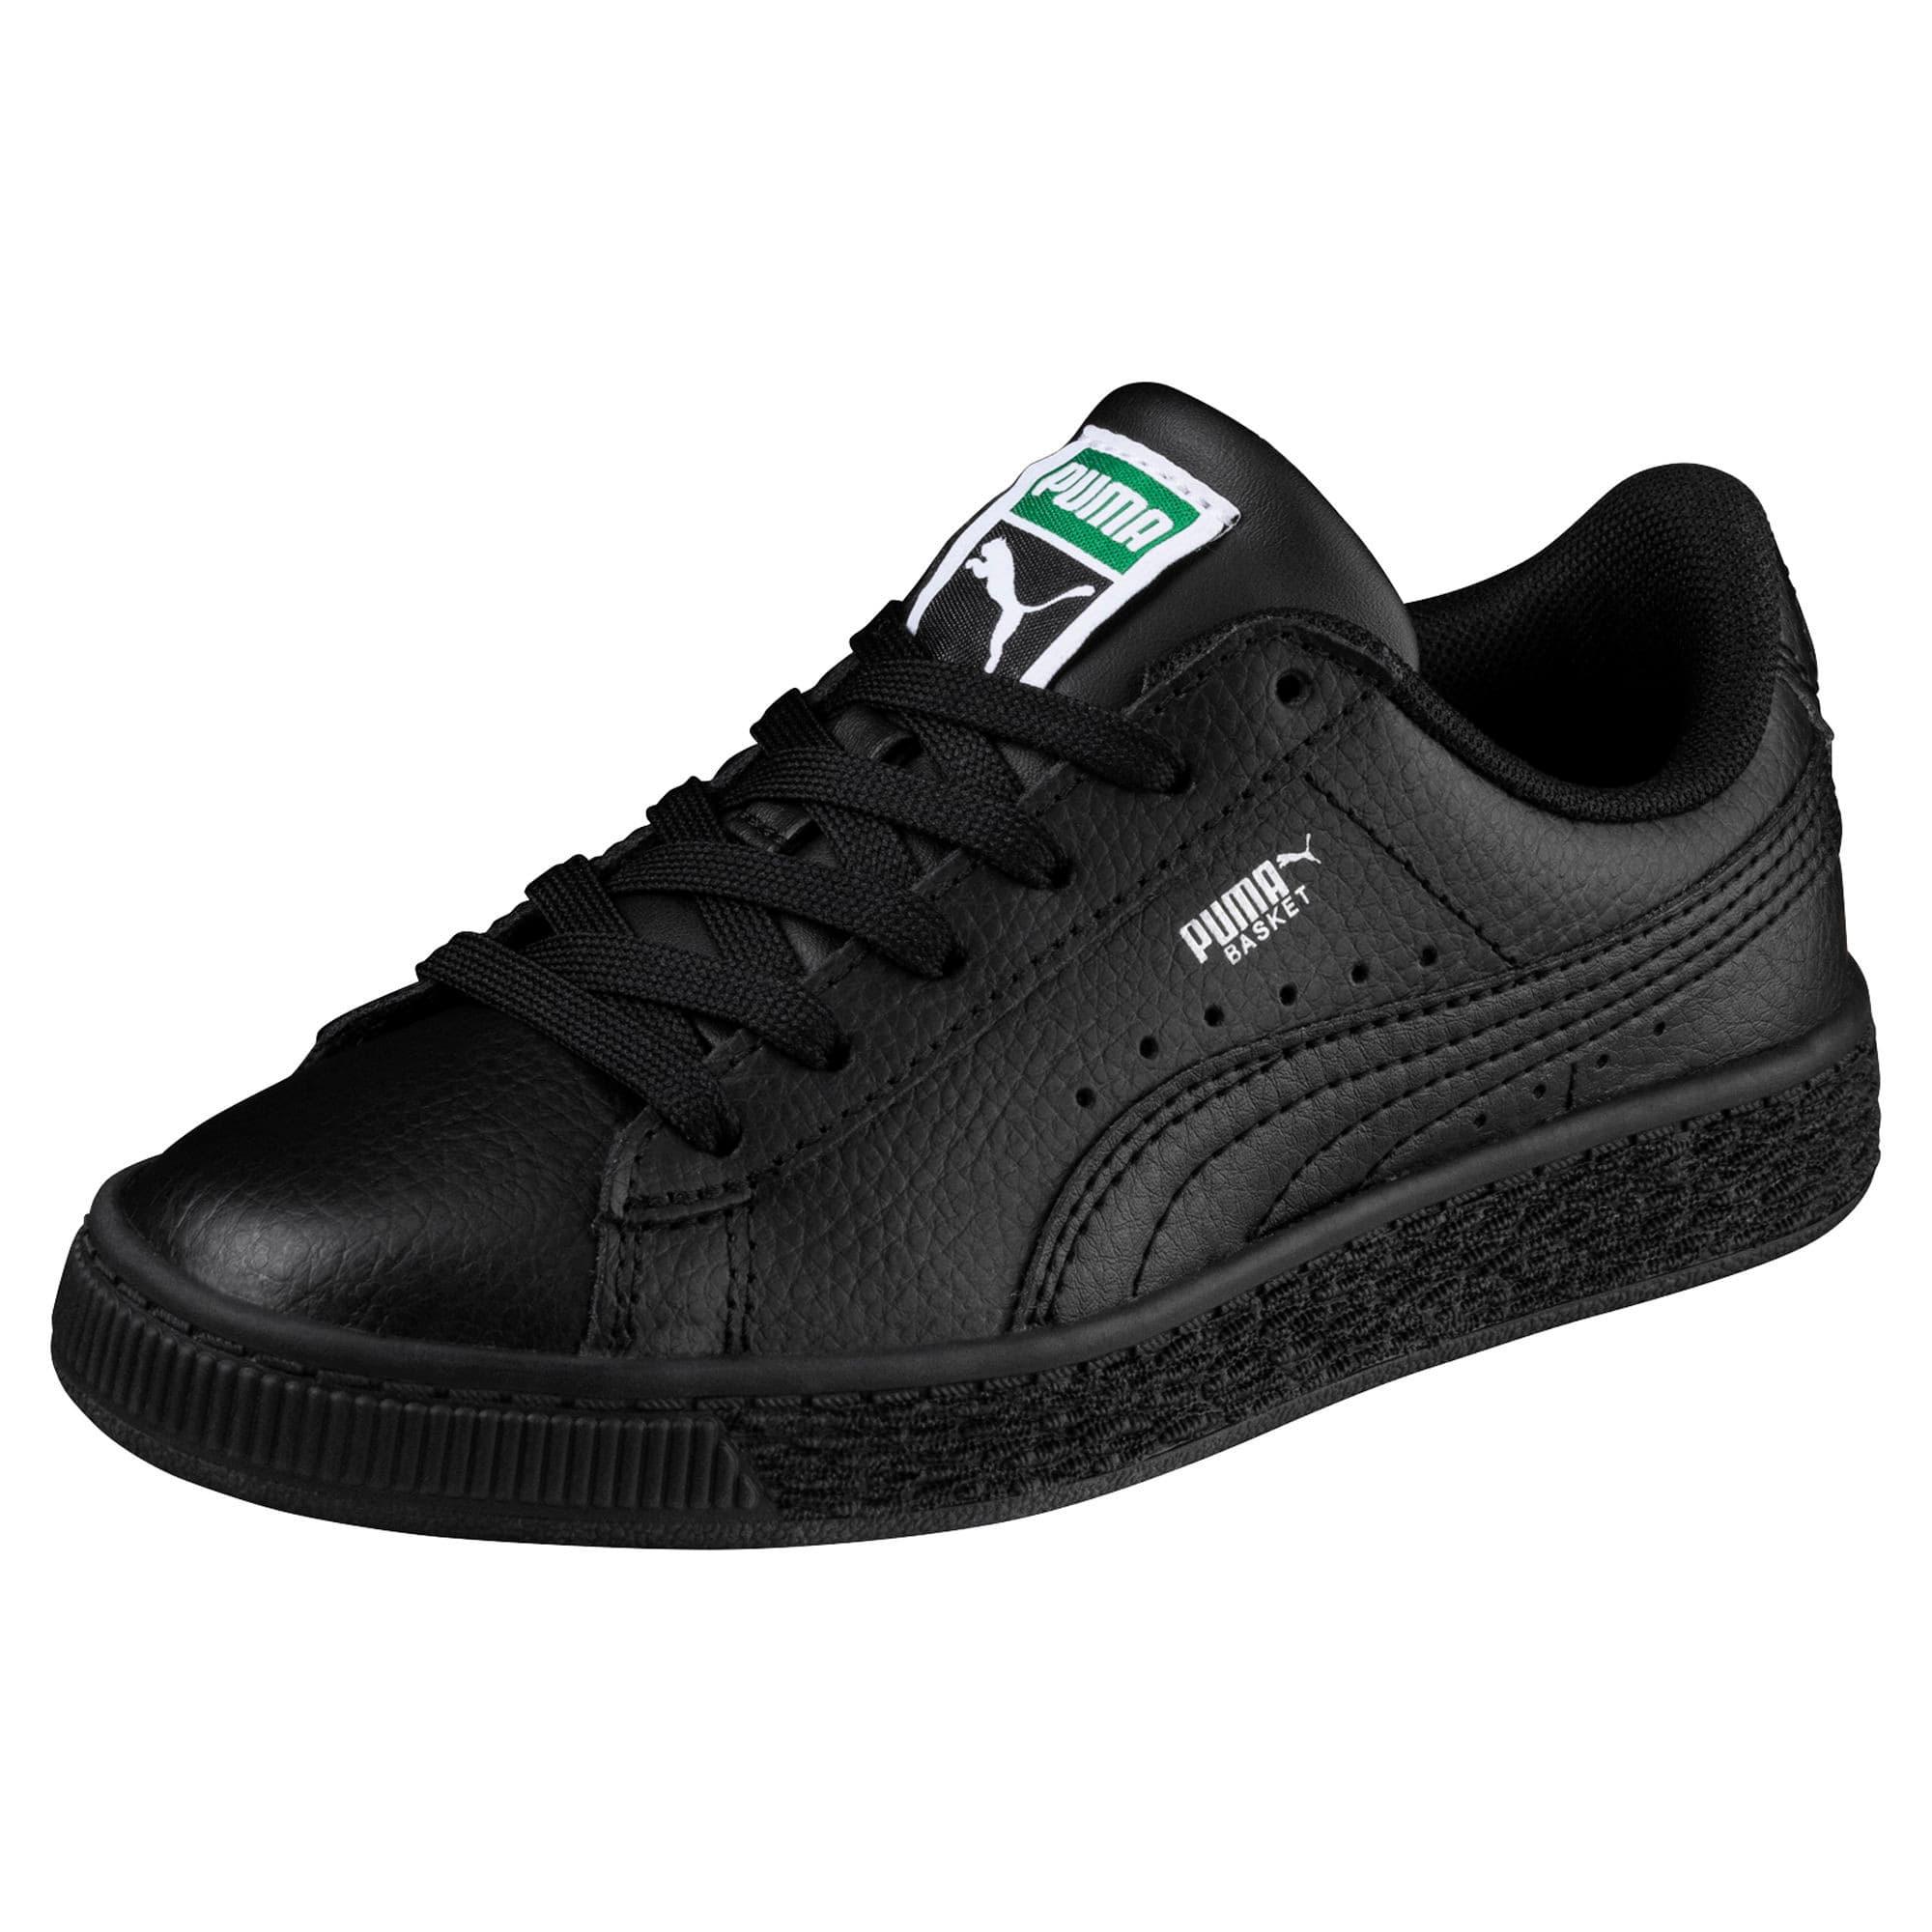 Thumbnail 2 of Basket Classic Little Kids' Shoes, Puma Black-Puma Black, medium